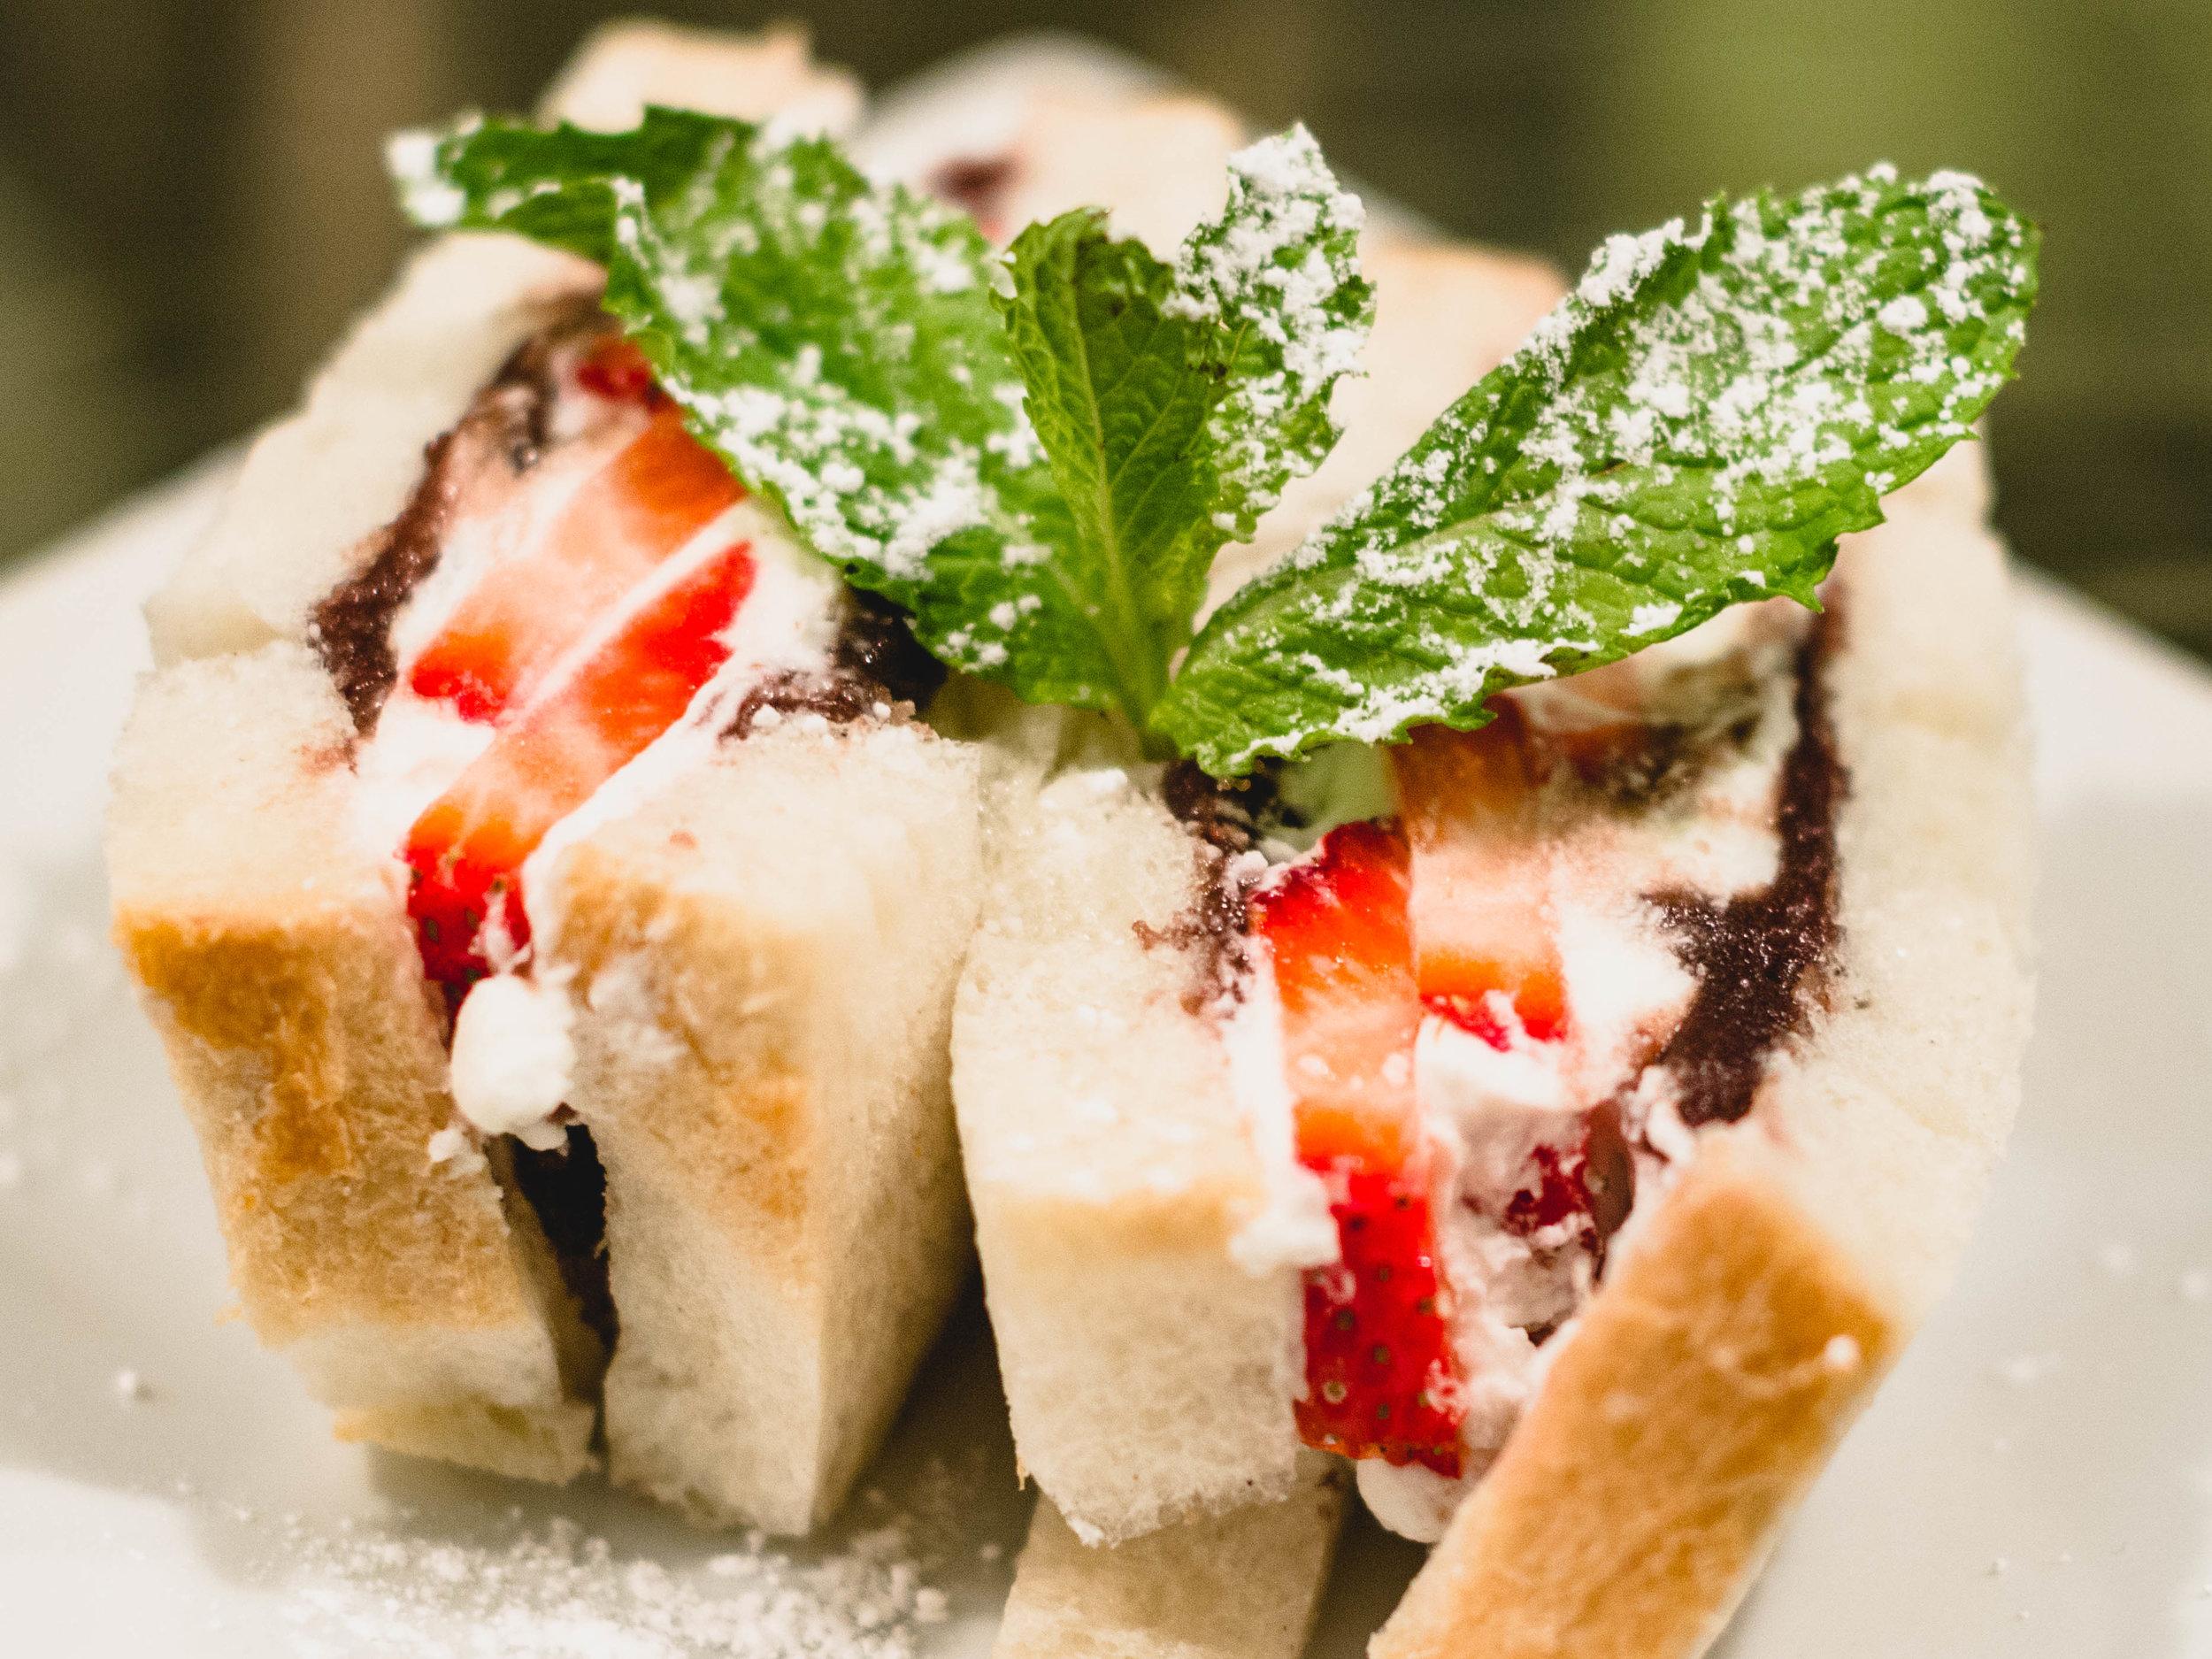 Fruits Sandwich